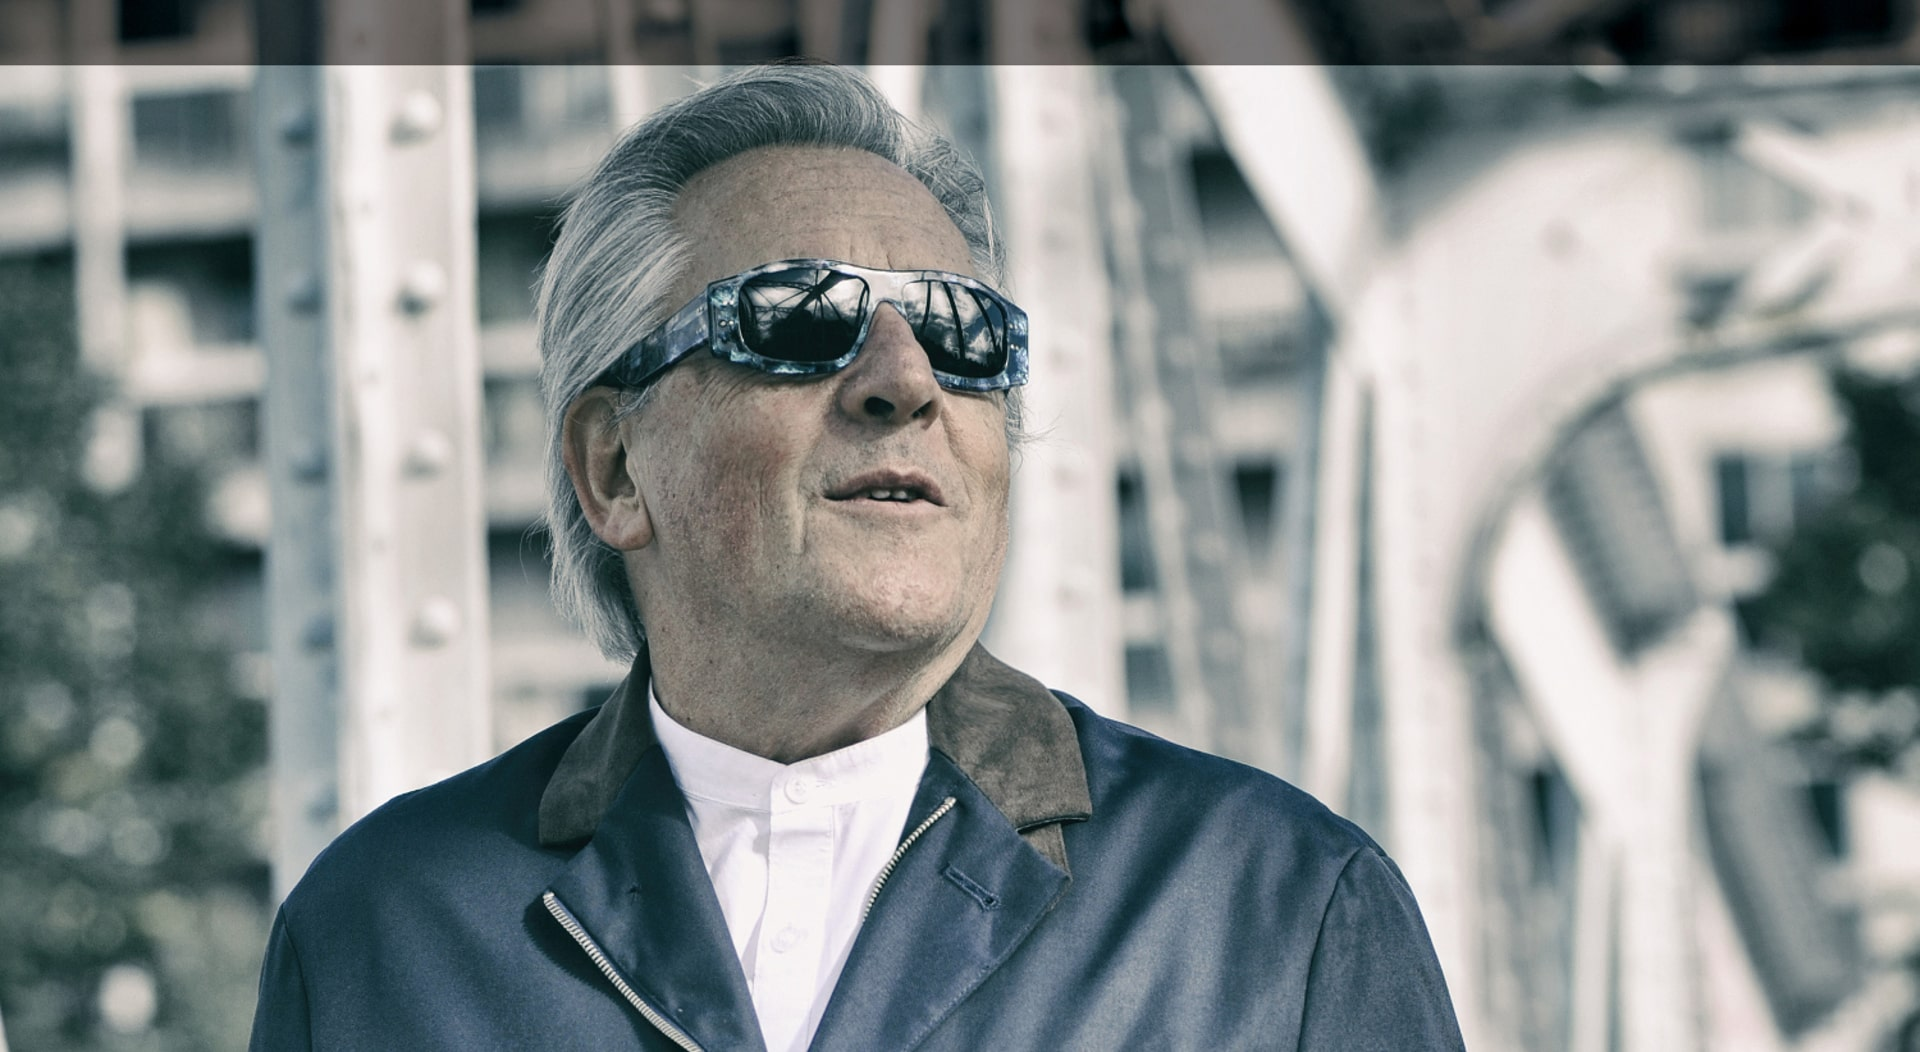 gilbert montagné concert 2019 saint martin de crau